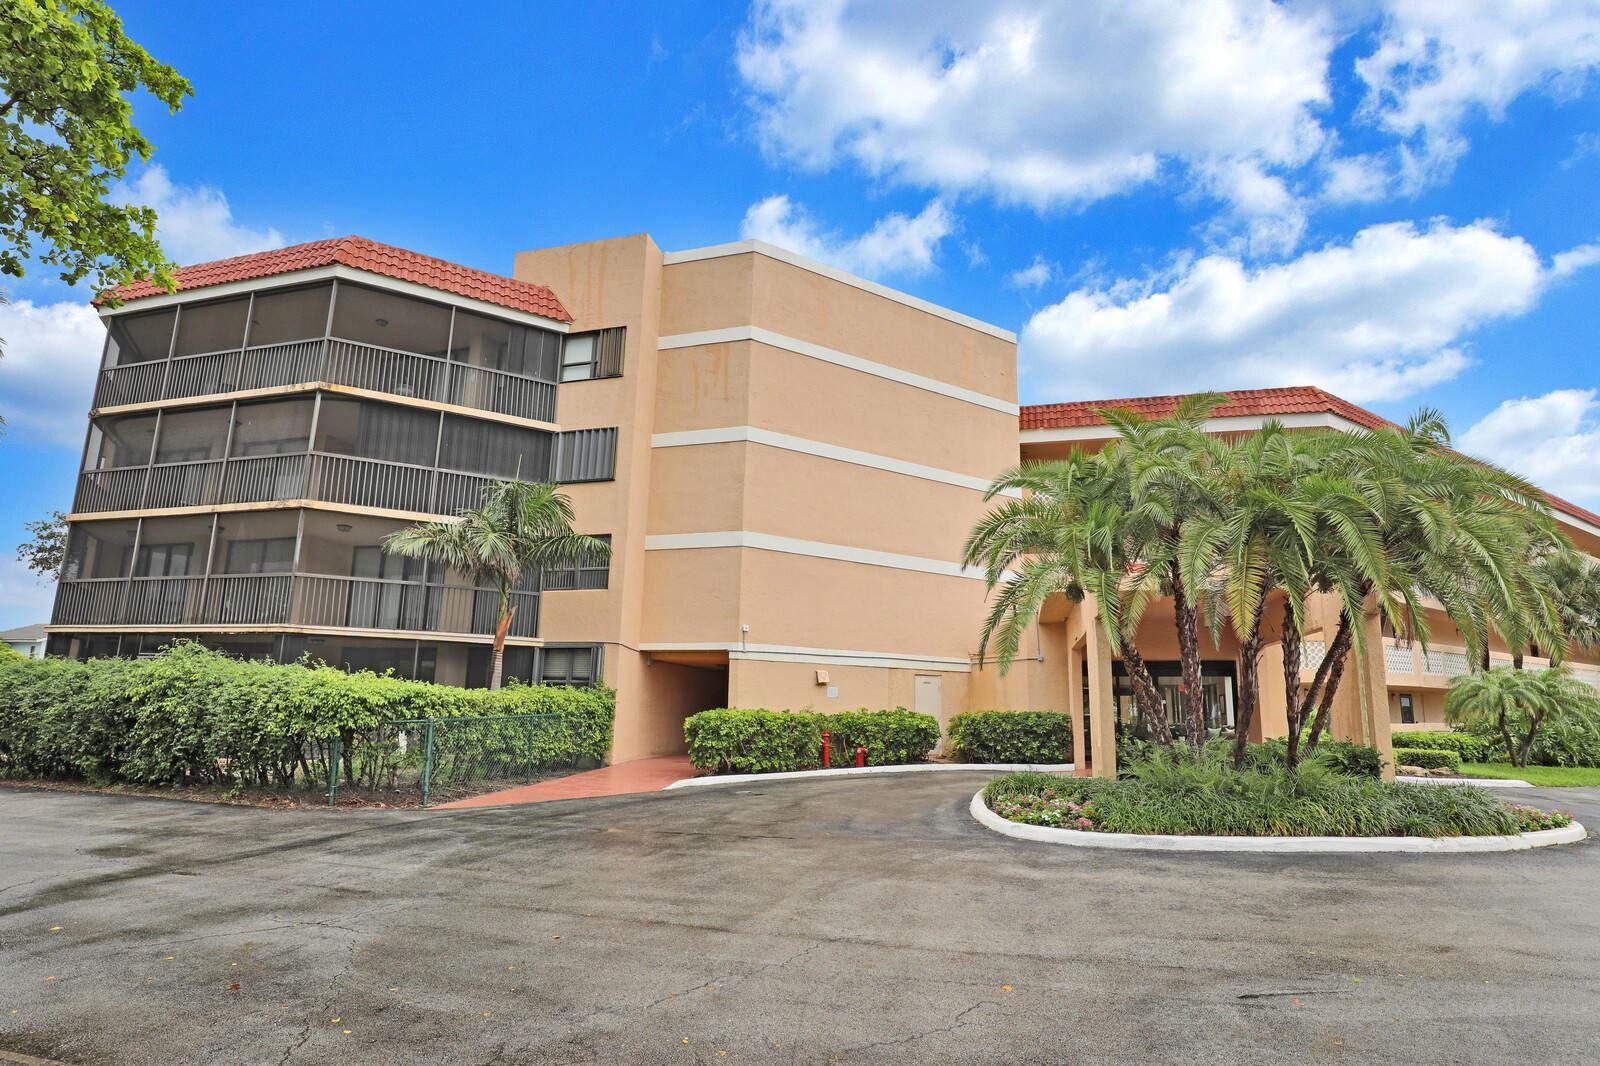 800 Jeffery Street #201, Boca Raton, FL 33487 - #: RX-10732824